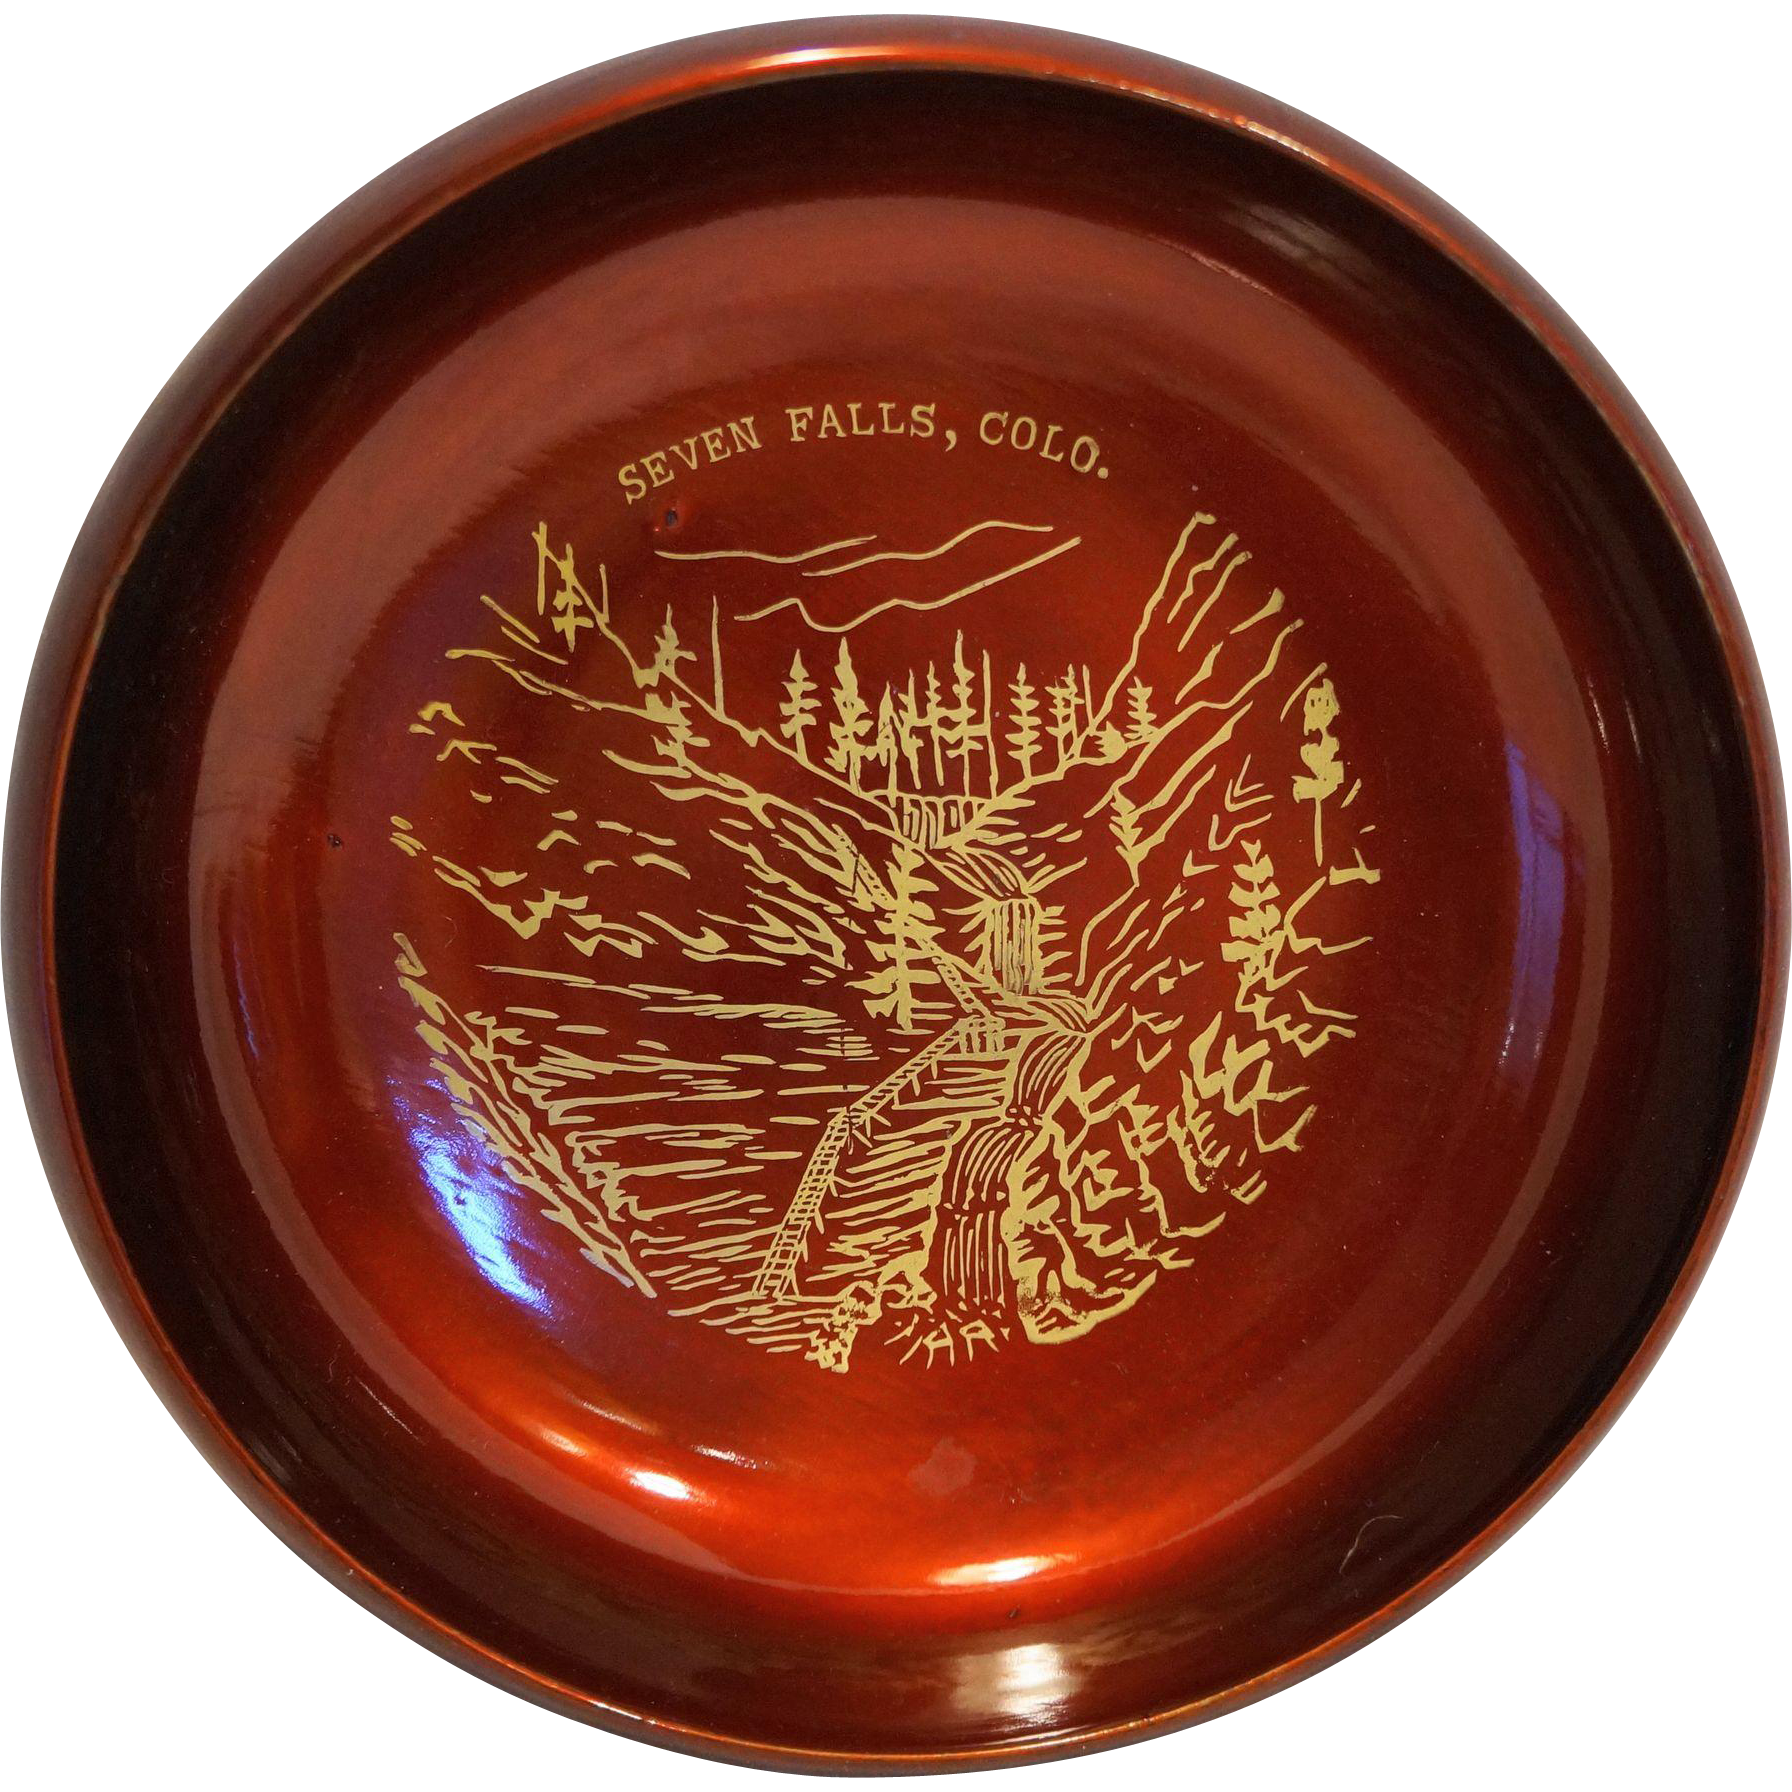 Seven Falls Colorado Red Lacquer Lacquerware Aizu Vintage Souvenir Small Salad Bowl